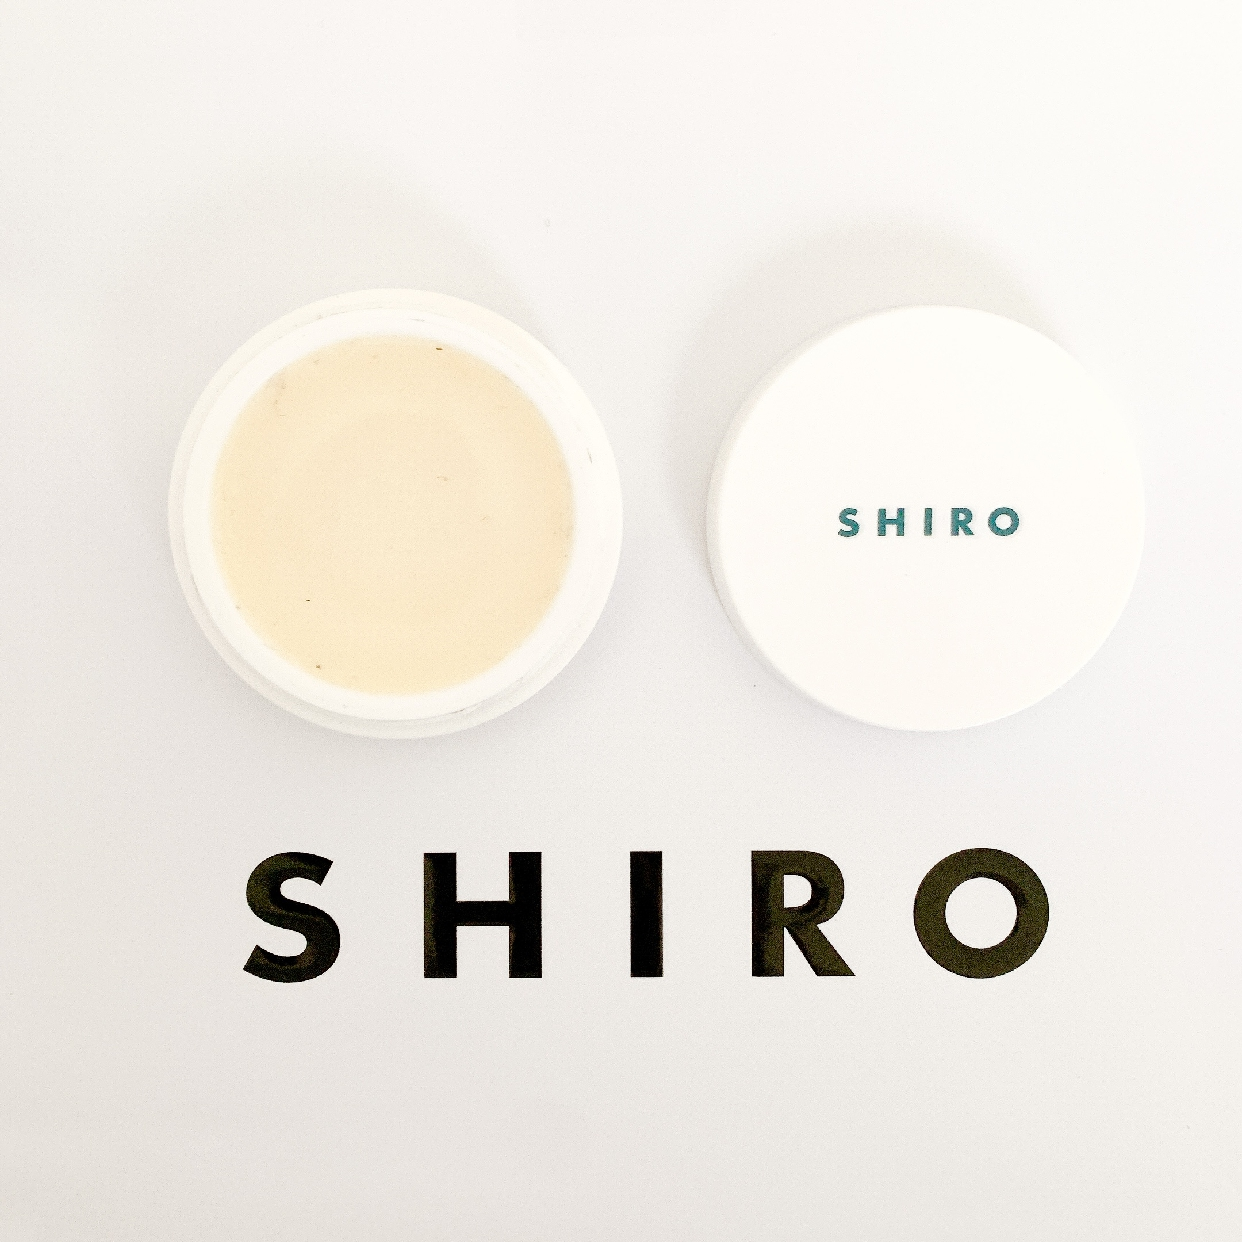 SHIRO(シロ) 練り香水の良い点・メリットに関するsasamiさんの口コミ画像2